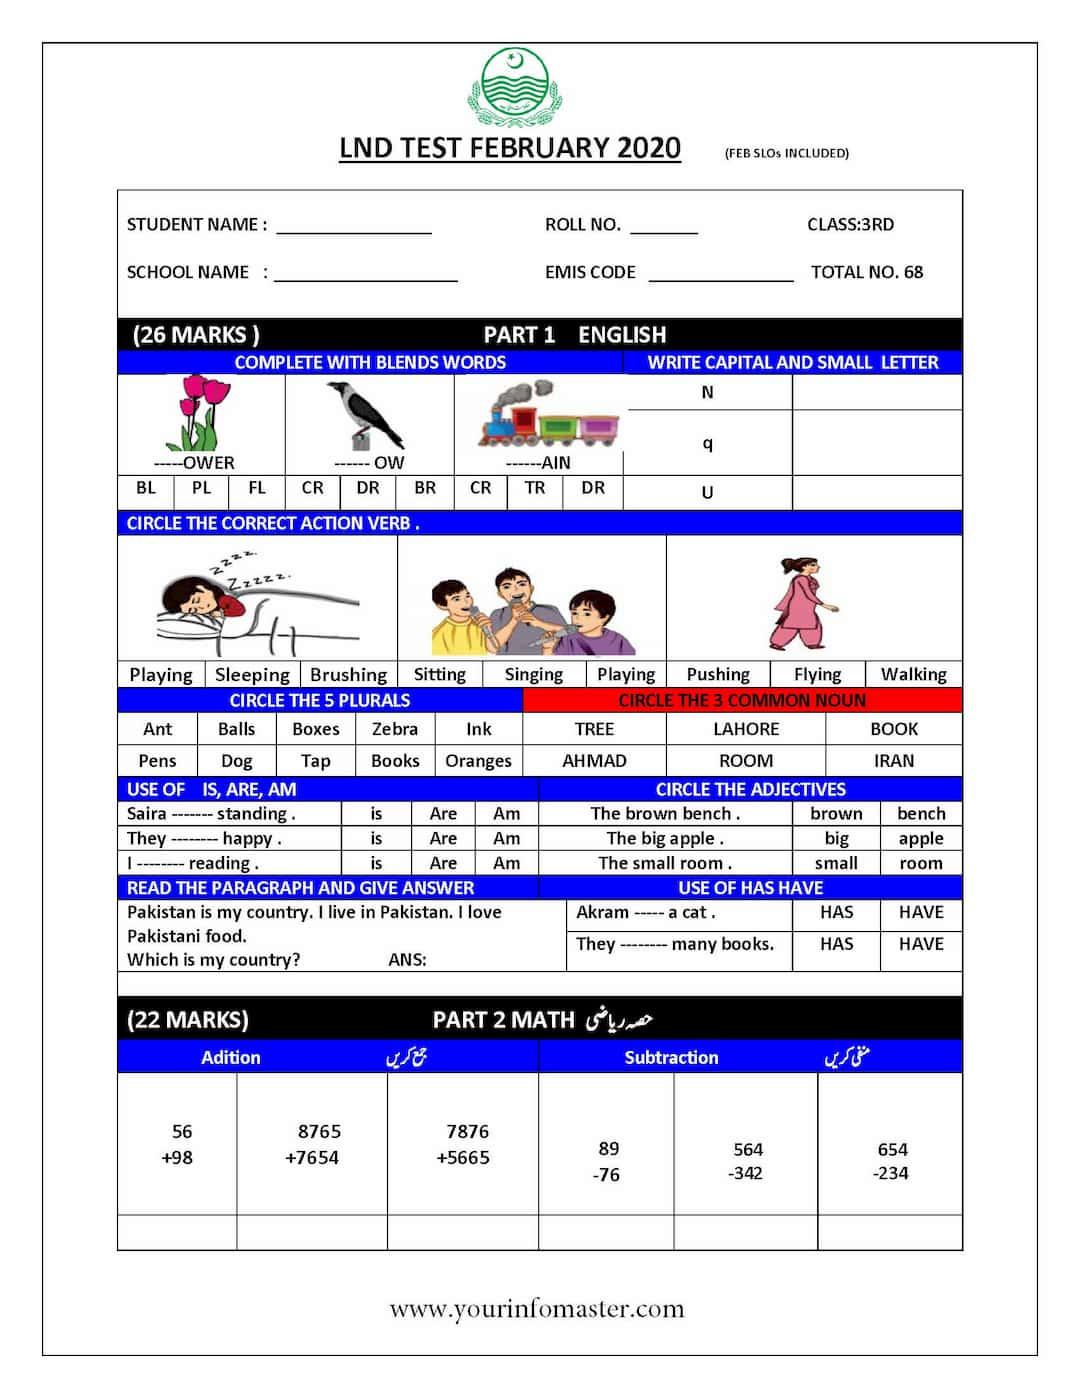 About LND, Class 3, Digital Pakistan, District Ranking, District Scorecard, education, education system, Educational Apps, free pdf books, free textbooks, Grade 3, January 2020, lnd 2020, LND App, LND monthly indicators, LND Paper, LND Papers February 2020, lnd practice test, lnd public, LND SLO, LND SLOs February 2020, LND Syllabus, LND Syllabus February 2020, LND Version 8, mea, Monthly Trends, new testbooks, pdf books, pitb, pmiu, School Monitoring, SLO Scorecard, Your Info Master